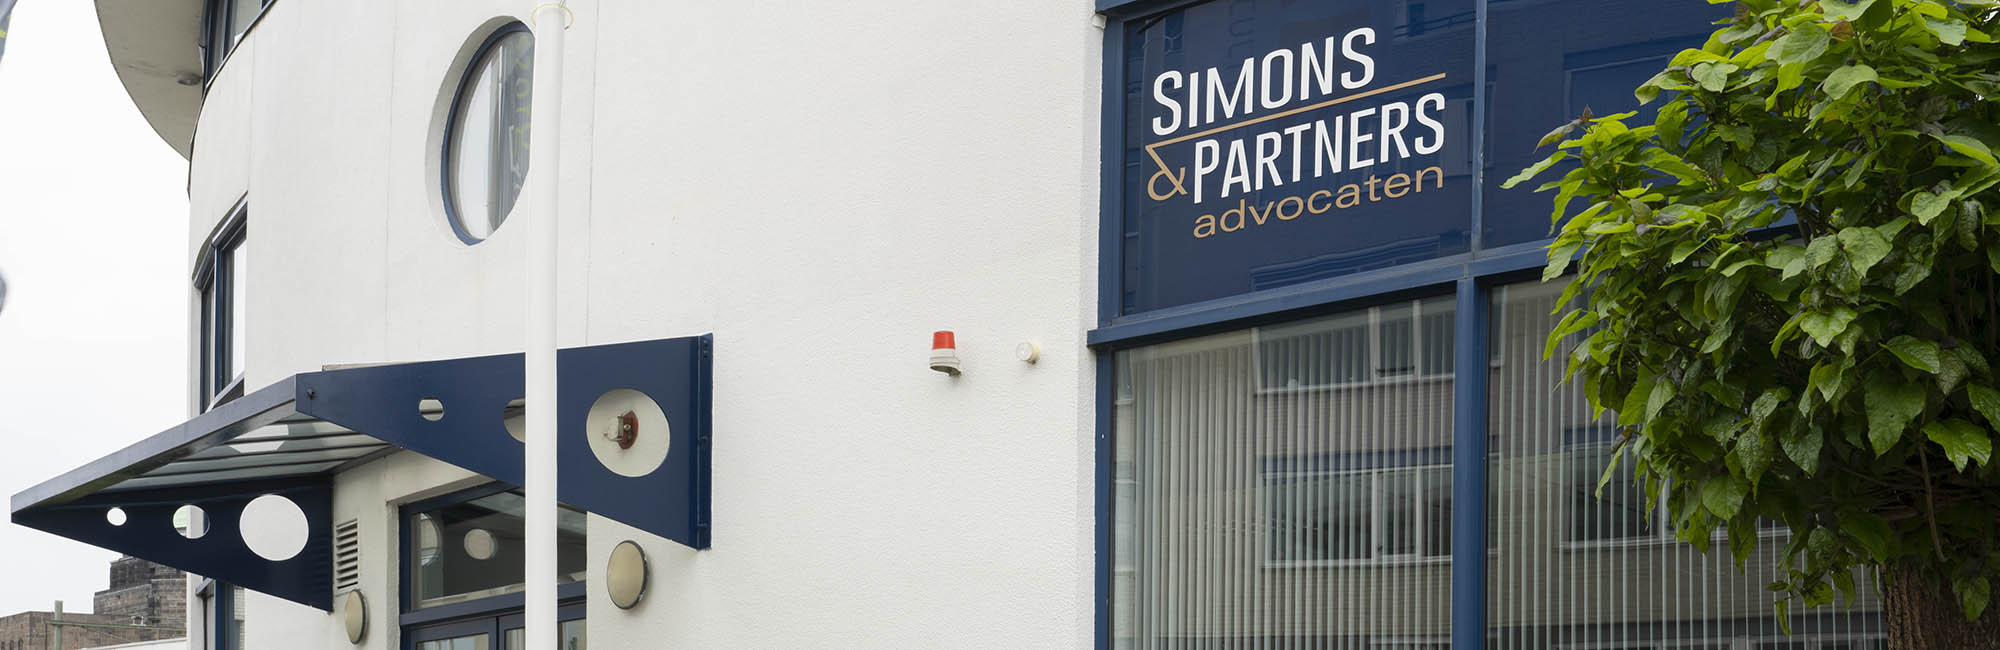 Simons & Partners Advocaten Maastricht